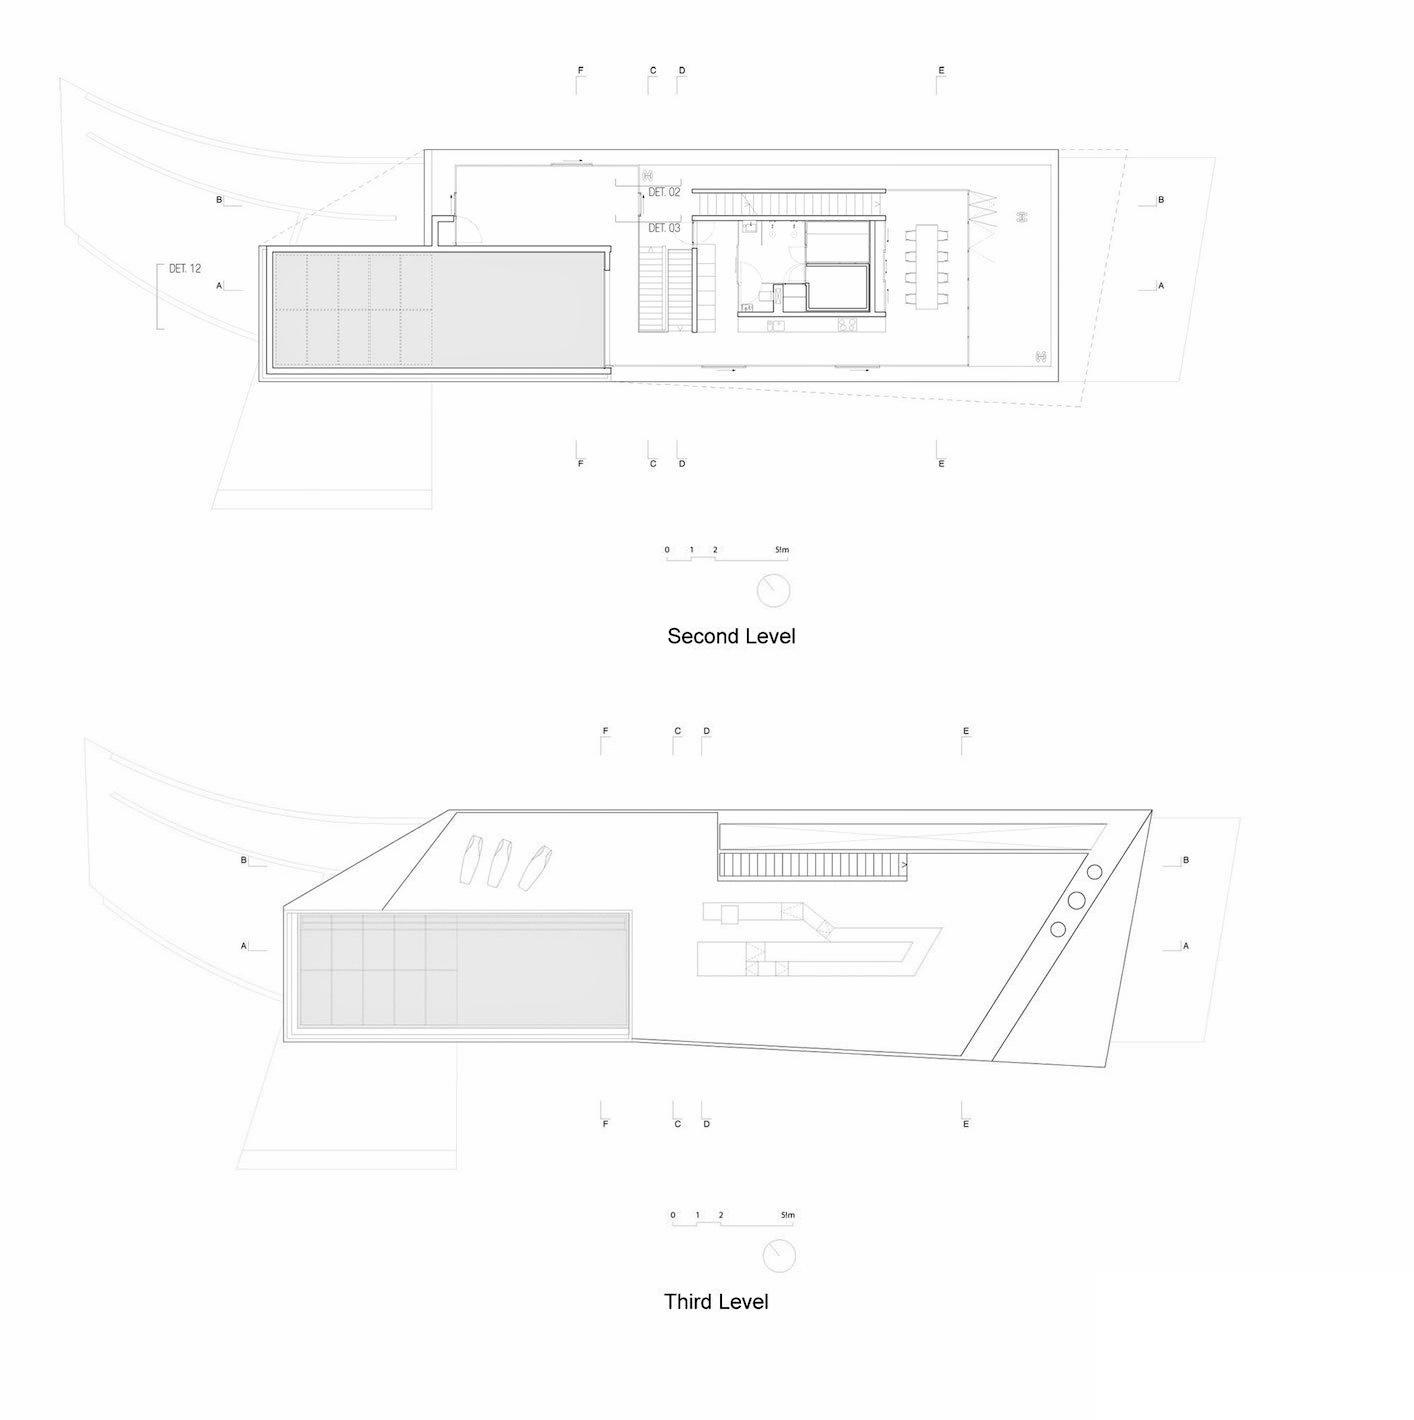 Floor Plans - Los Monteros Luxury Residence - Marbella, Málaga, Spain